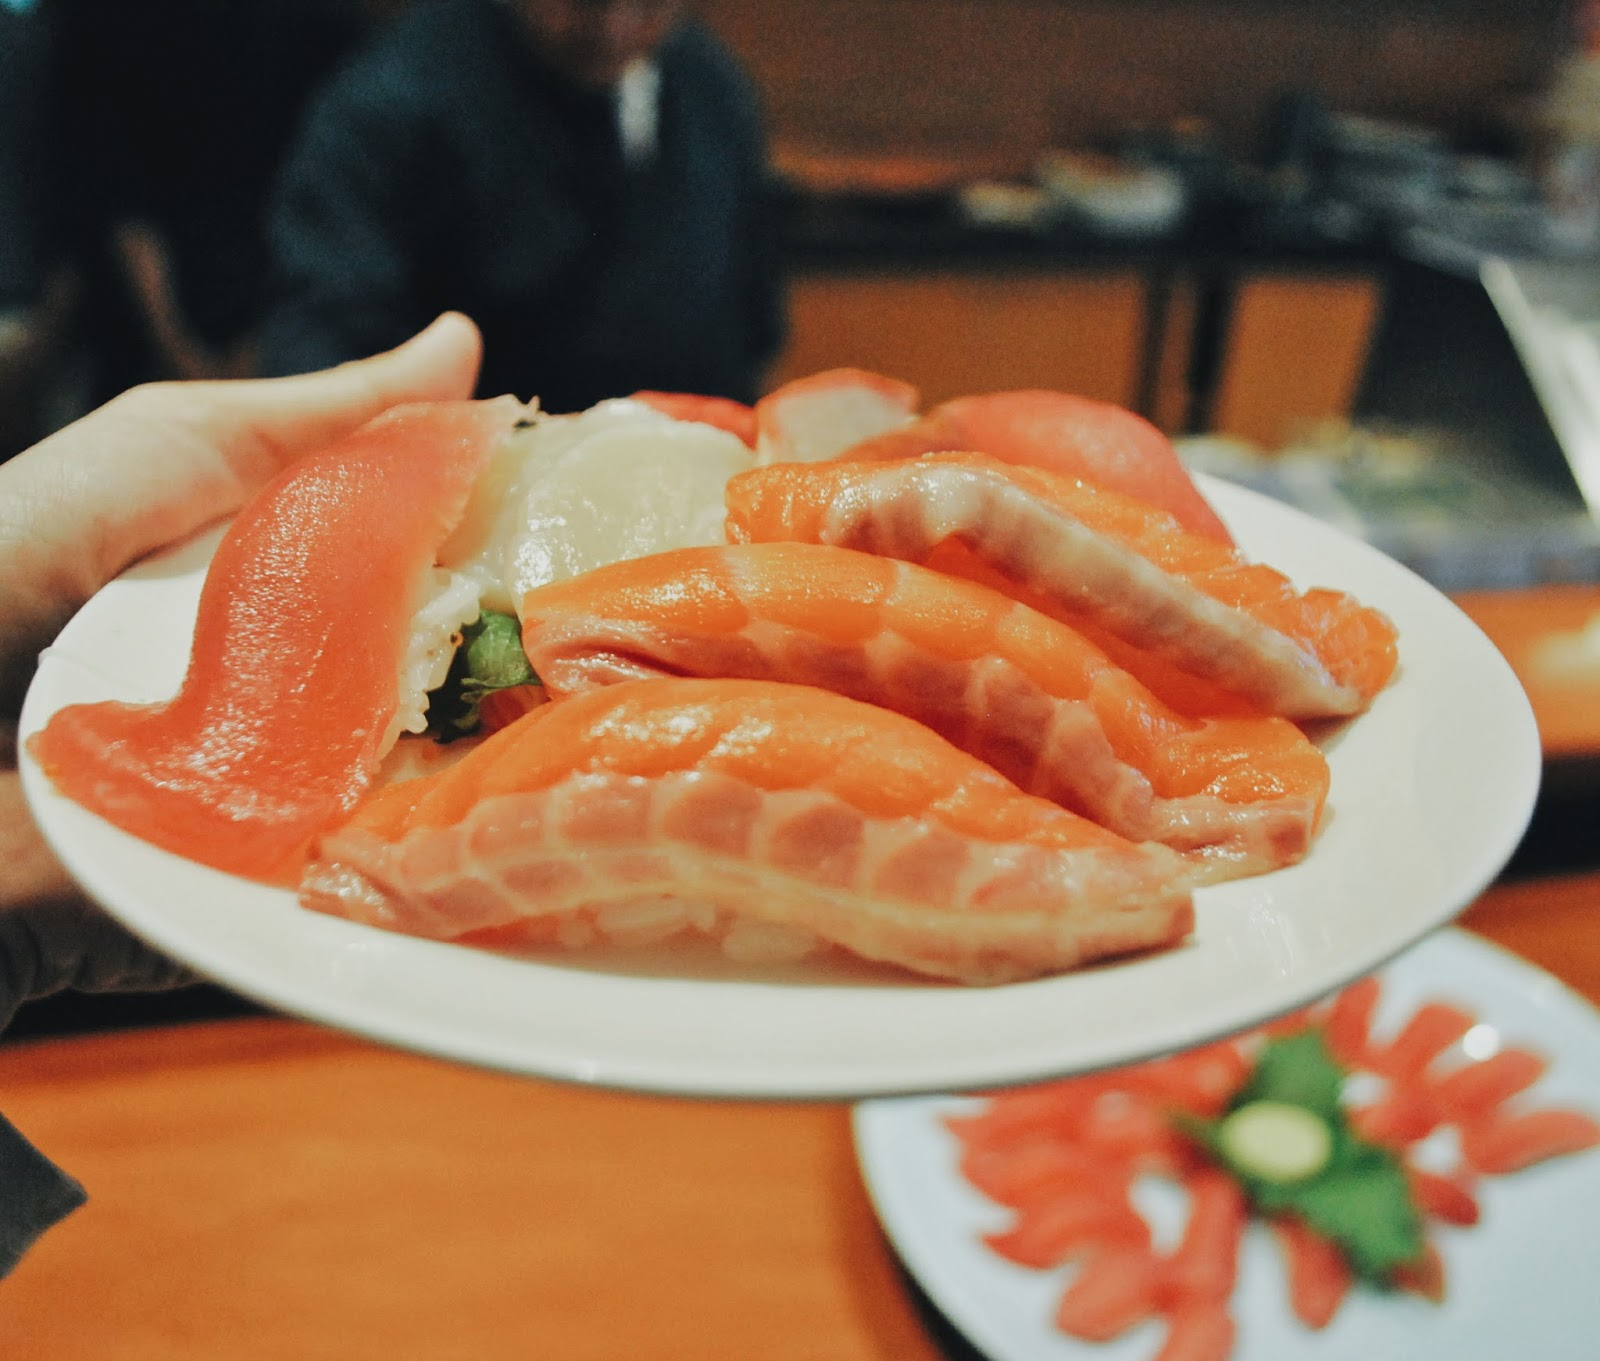 Allysa & Sushi : Sejarah Tak Perlu Berdarah - Sushi Masa